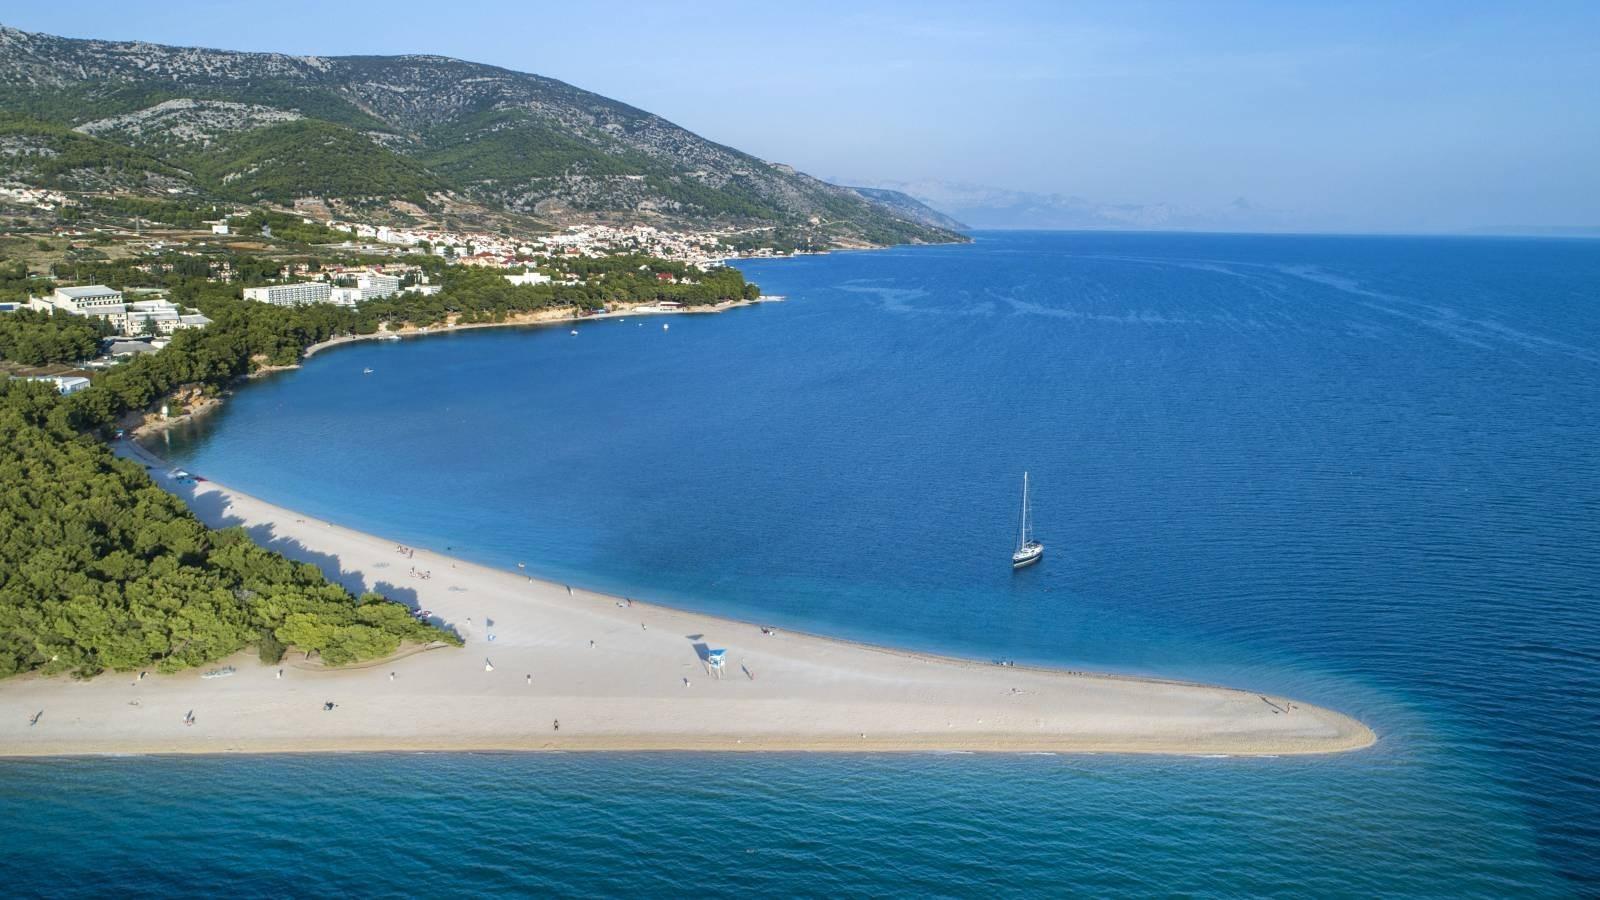 Fonkelnieuw Frühlingsangebote in Bol auf der Insel Brač, Kroatien - Spa inklusive NC-08